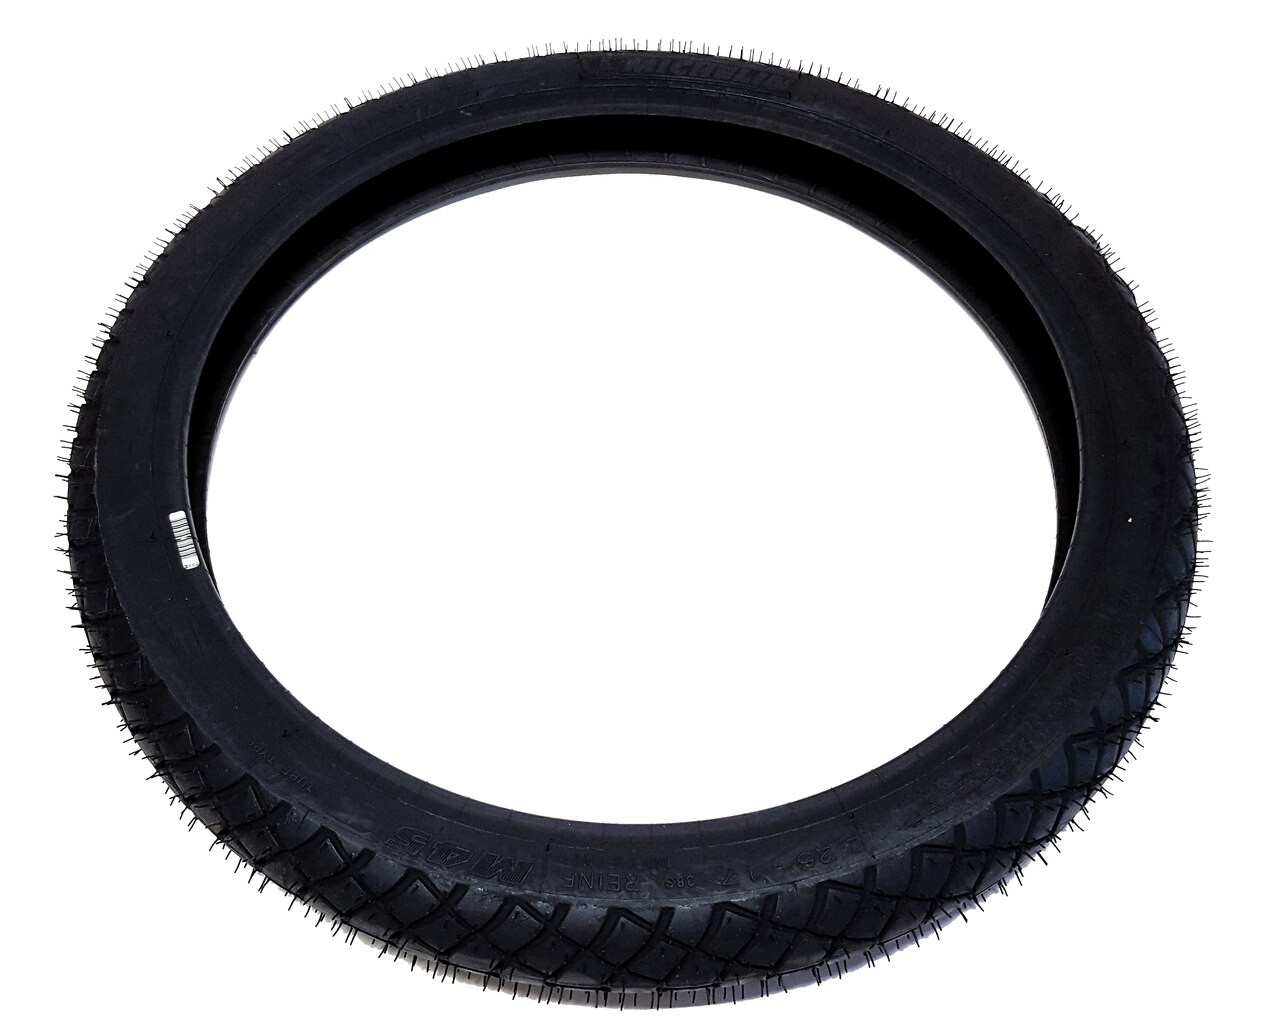 "Michelin M45 2.75"" x 17"" Moped Tire"